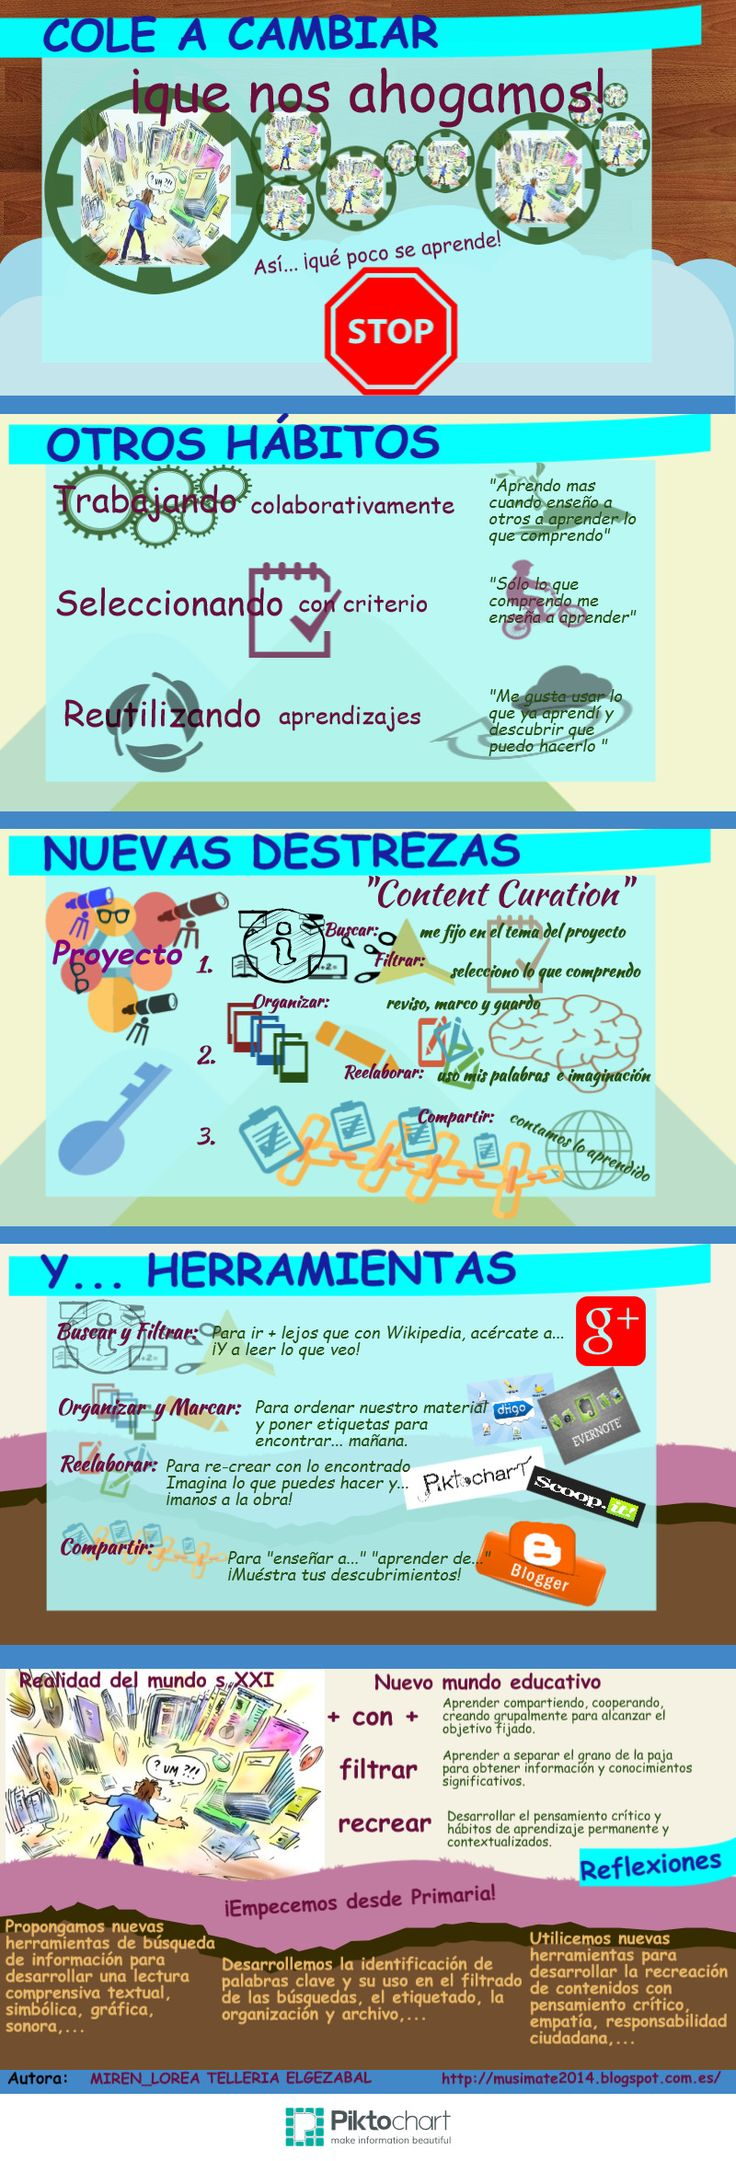 Unidad 5 Infografía   @Piktochart Infographic